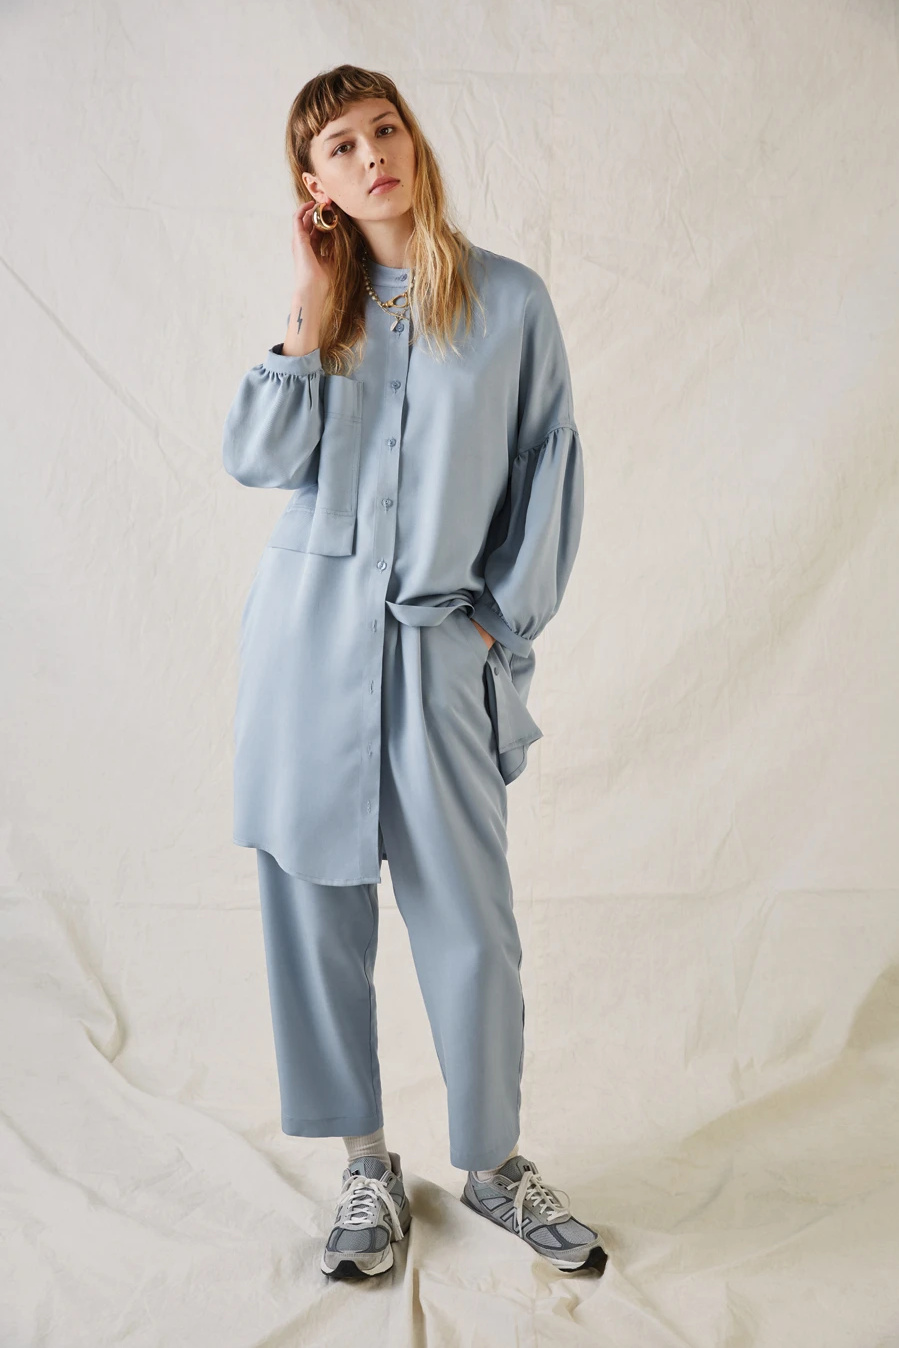 Robe Eastwood, 242$, pantalon, 236$, Ève Gravel